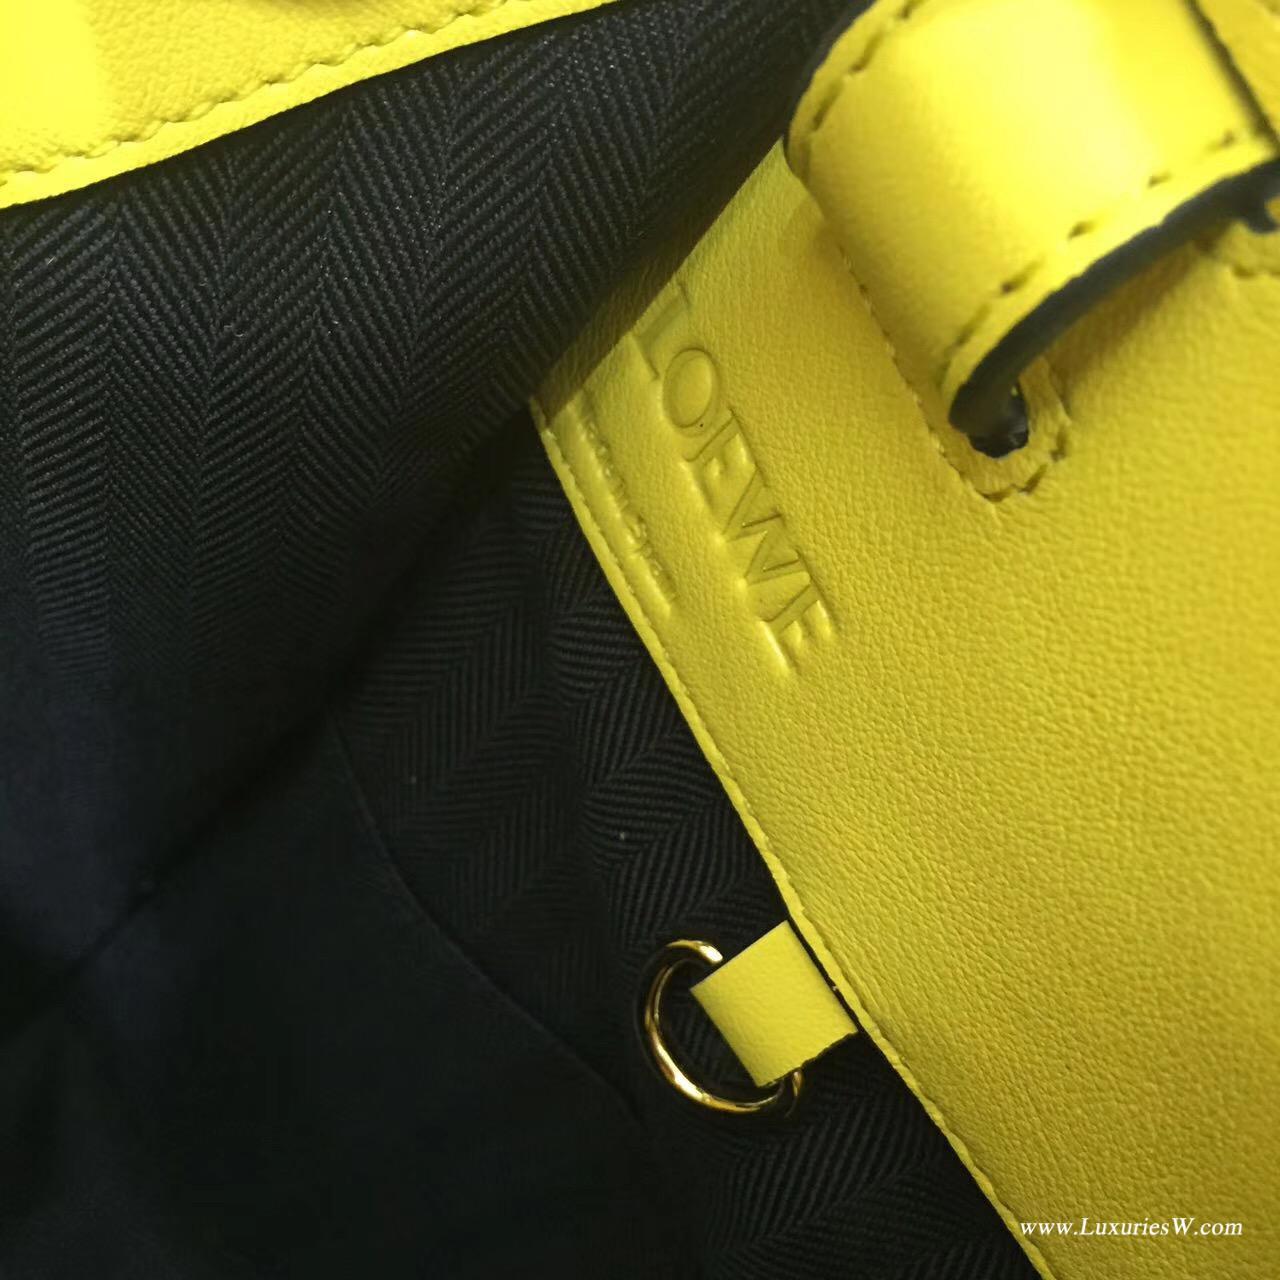 Loewe hammock bag 小吊床包檸檬黃,采用進口柔軟小牛皮